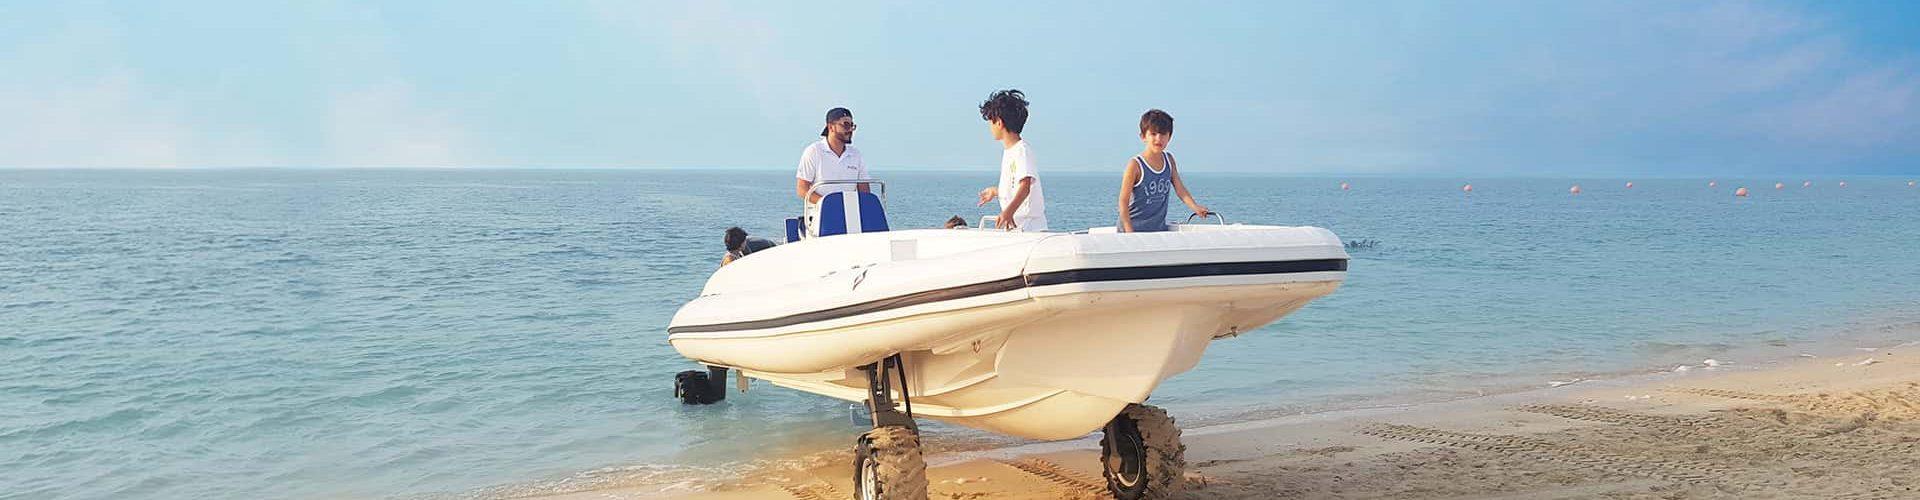 amphibious-beachlander-boat